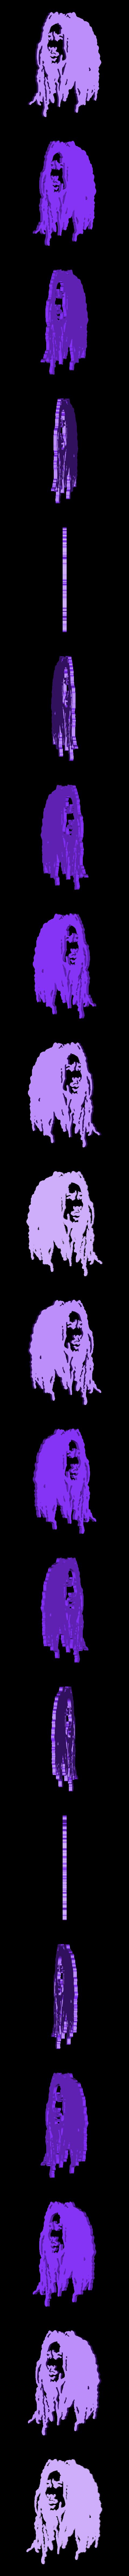 9.Bob Marley.stl Download STL file Low Poly Face Wall Sculpture 2D • 3D printable object, UnpredictableLab